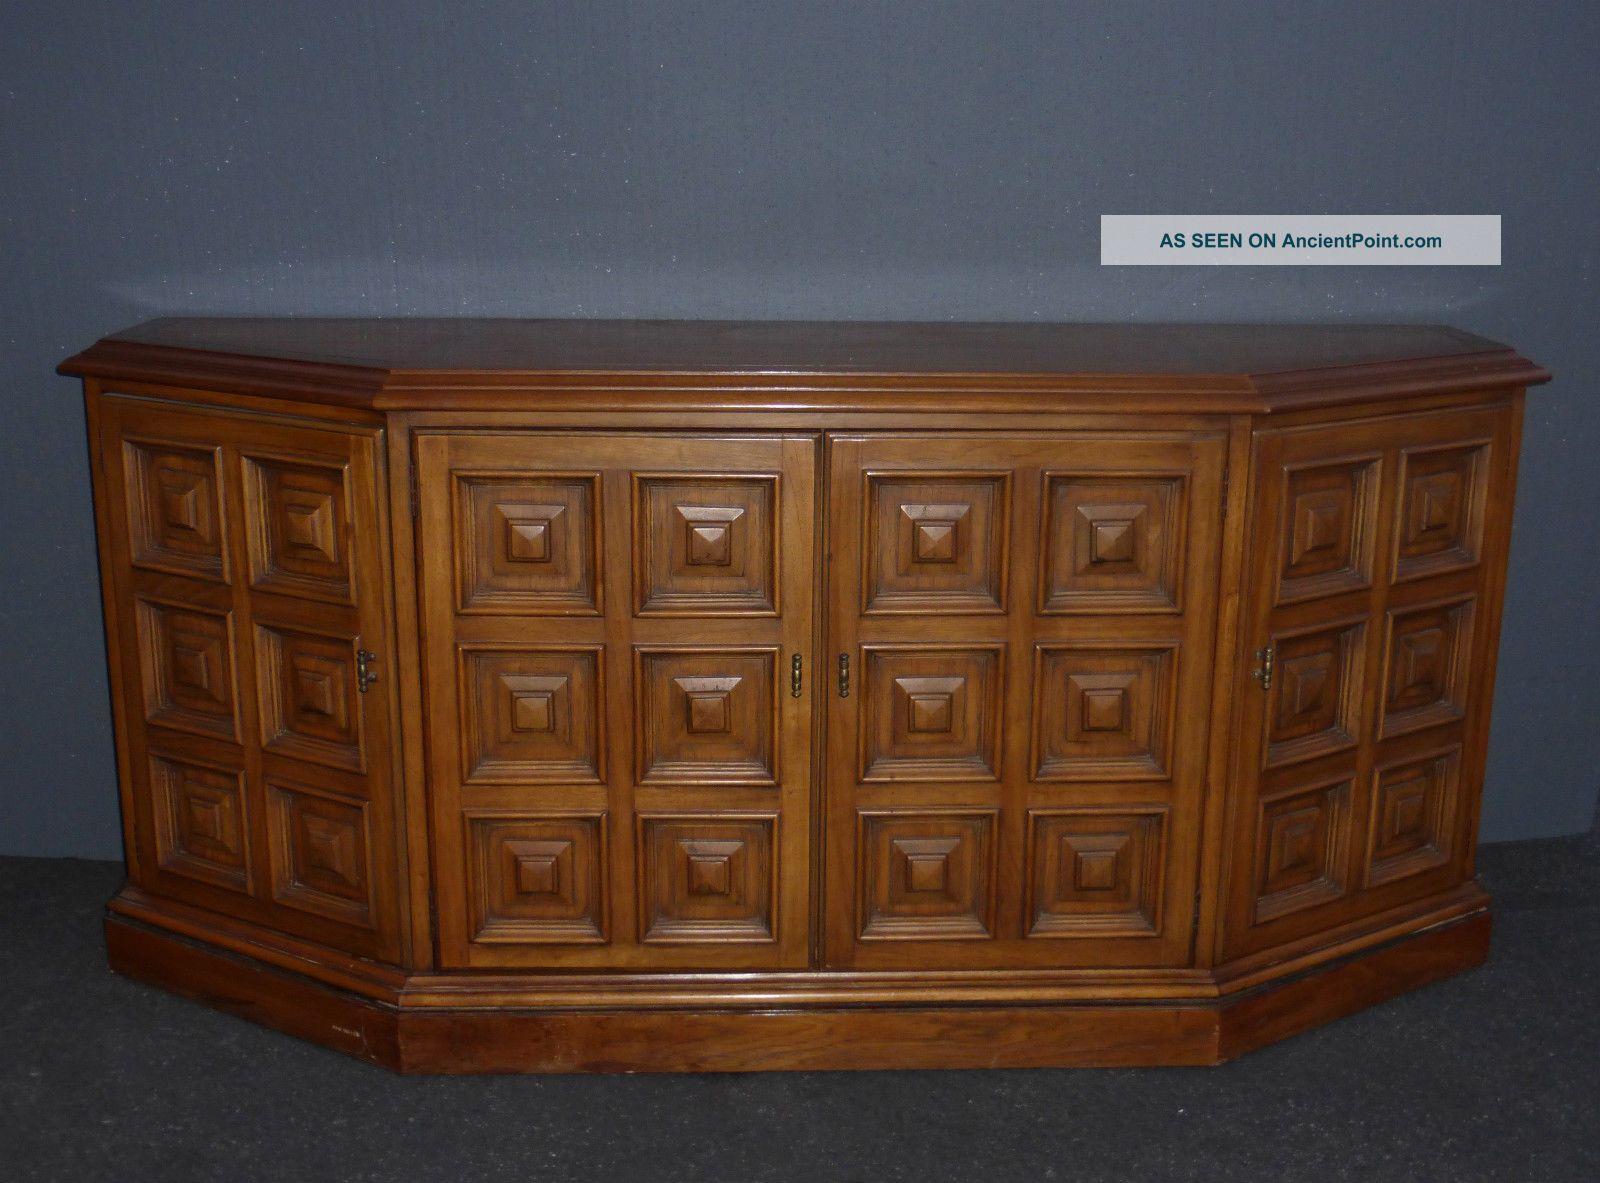 Vintage Drexel Mid Century Solid Wood Ornate Credenza Buffet Sideboard 1963